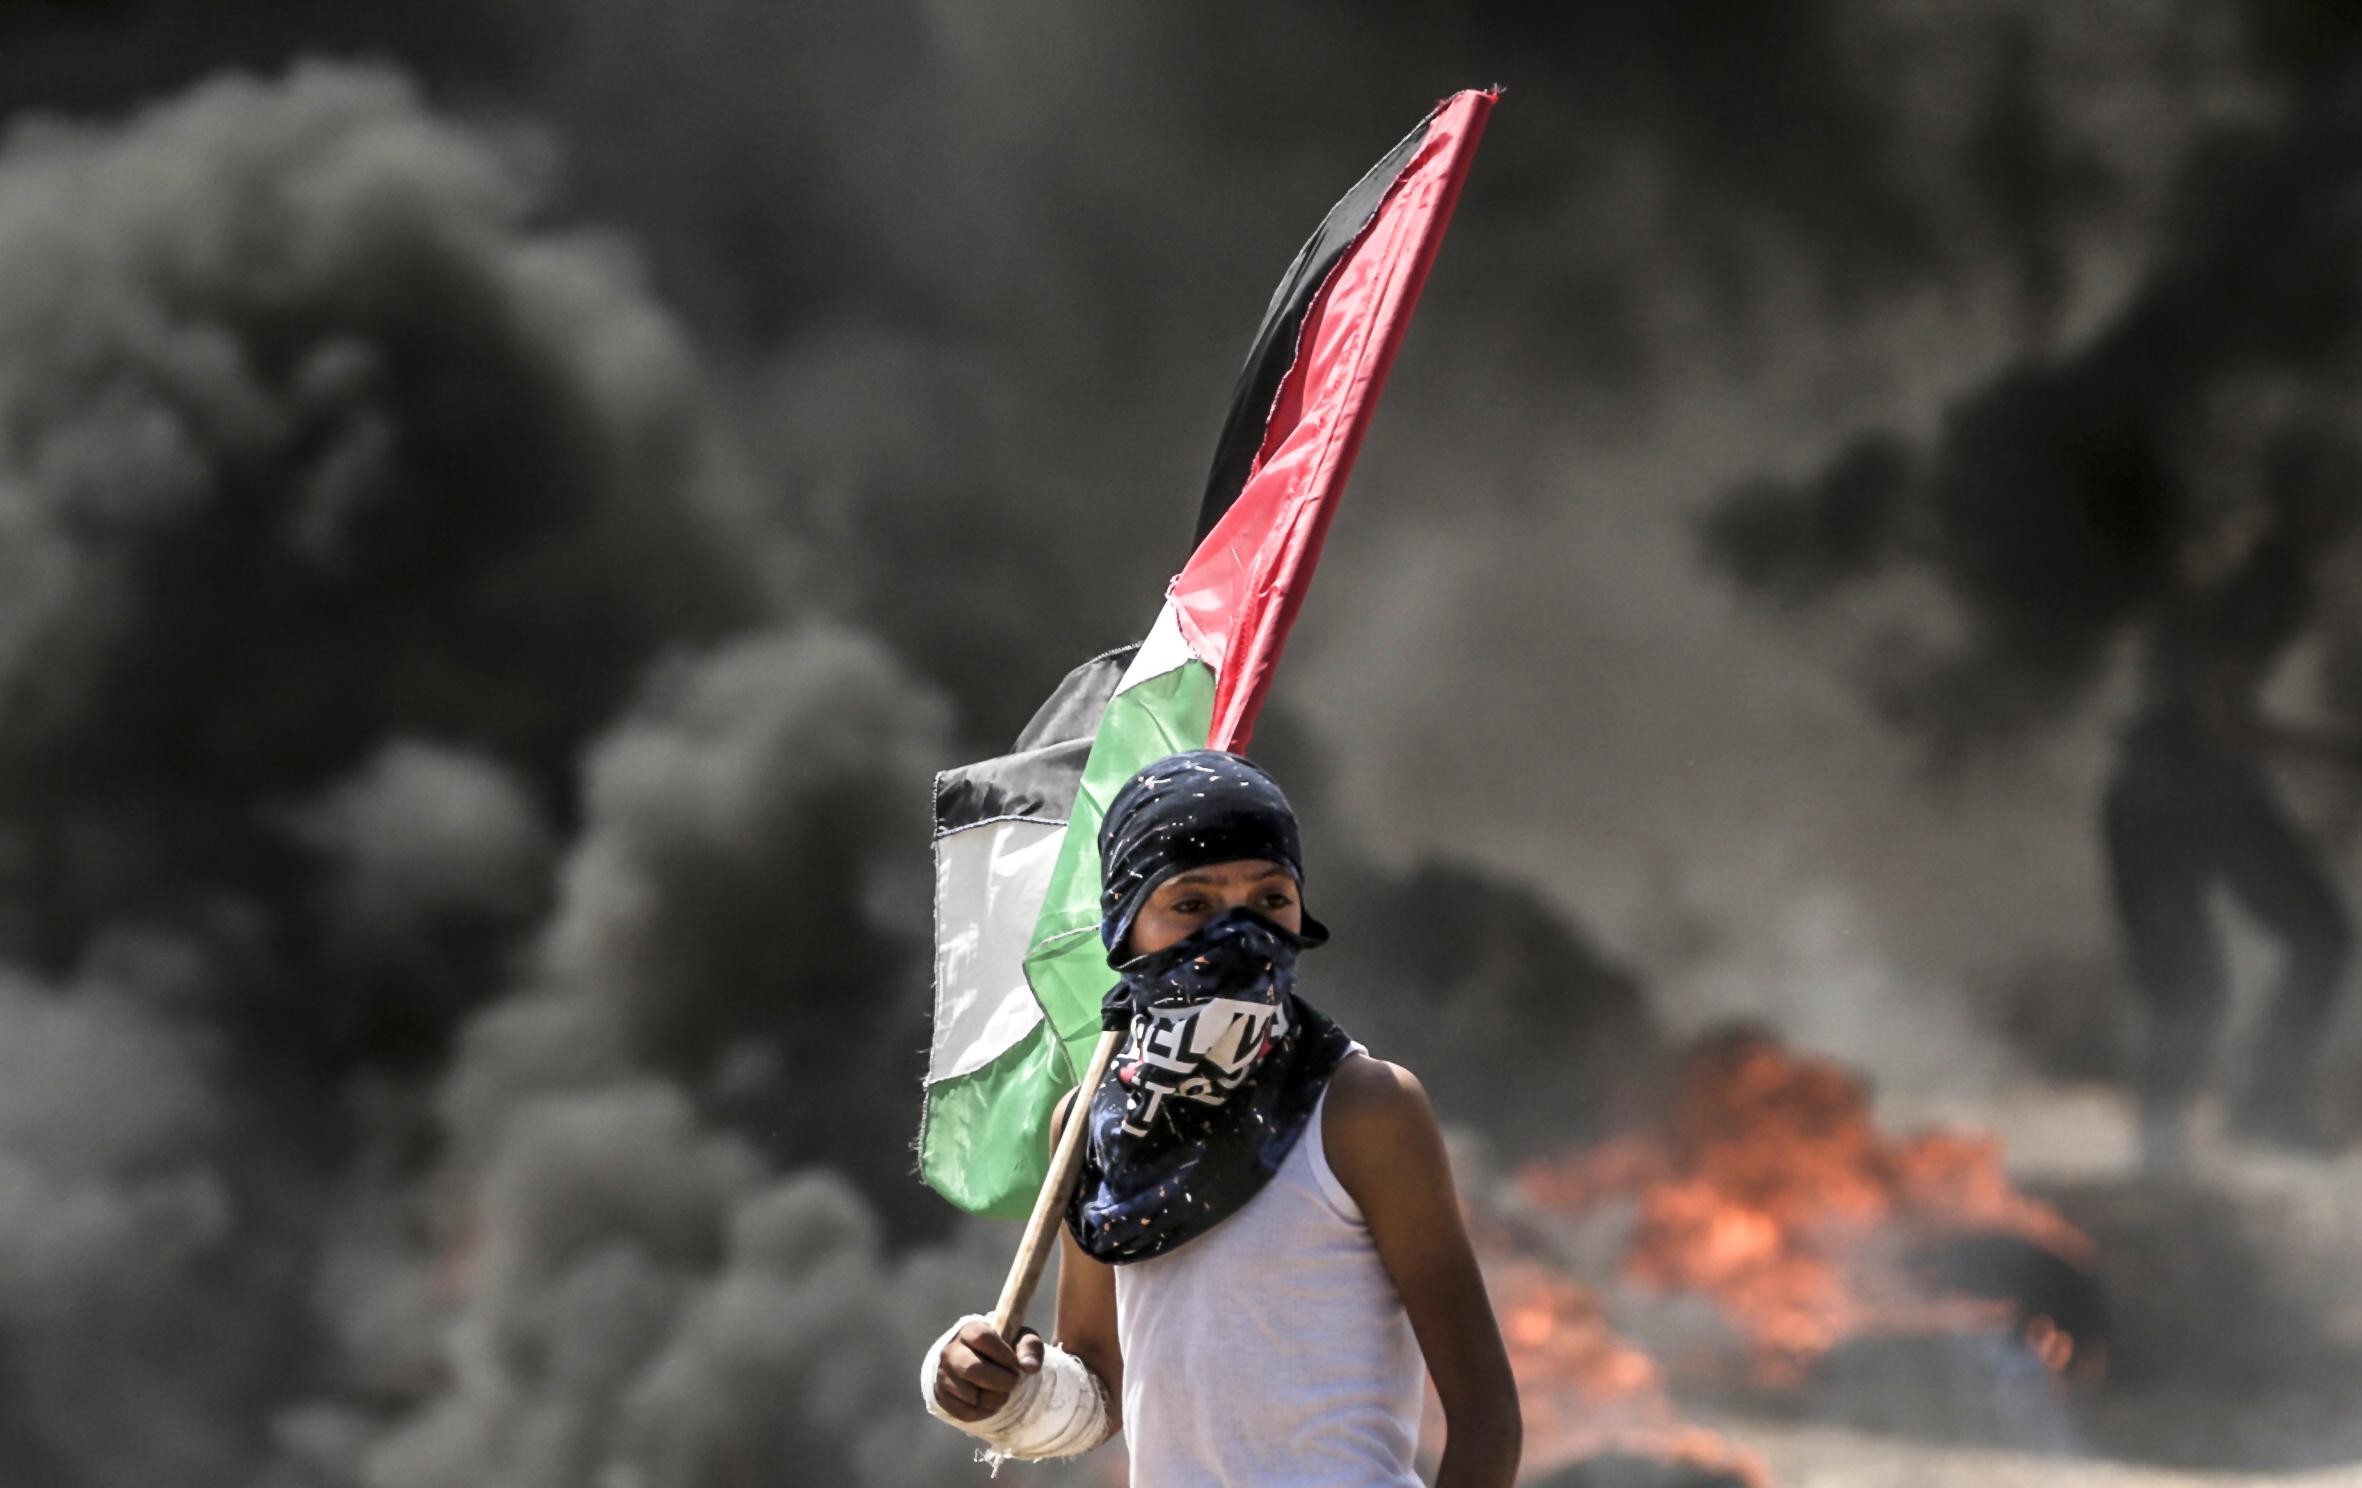 فلسطينى